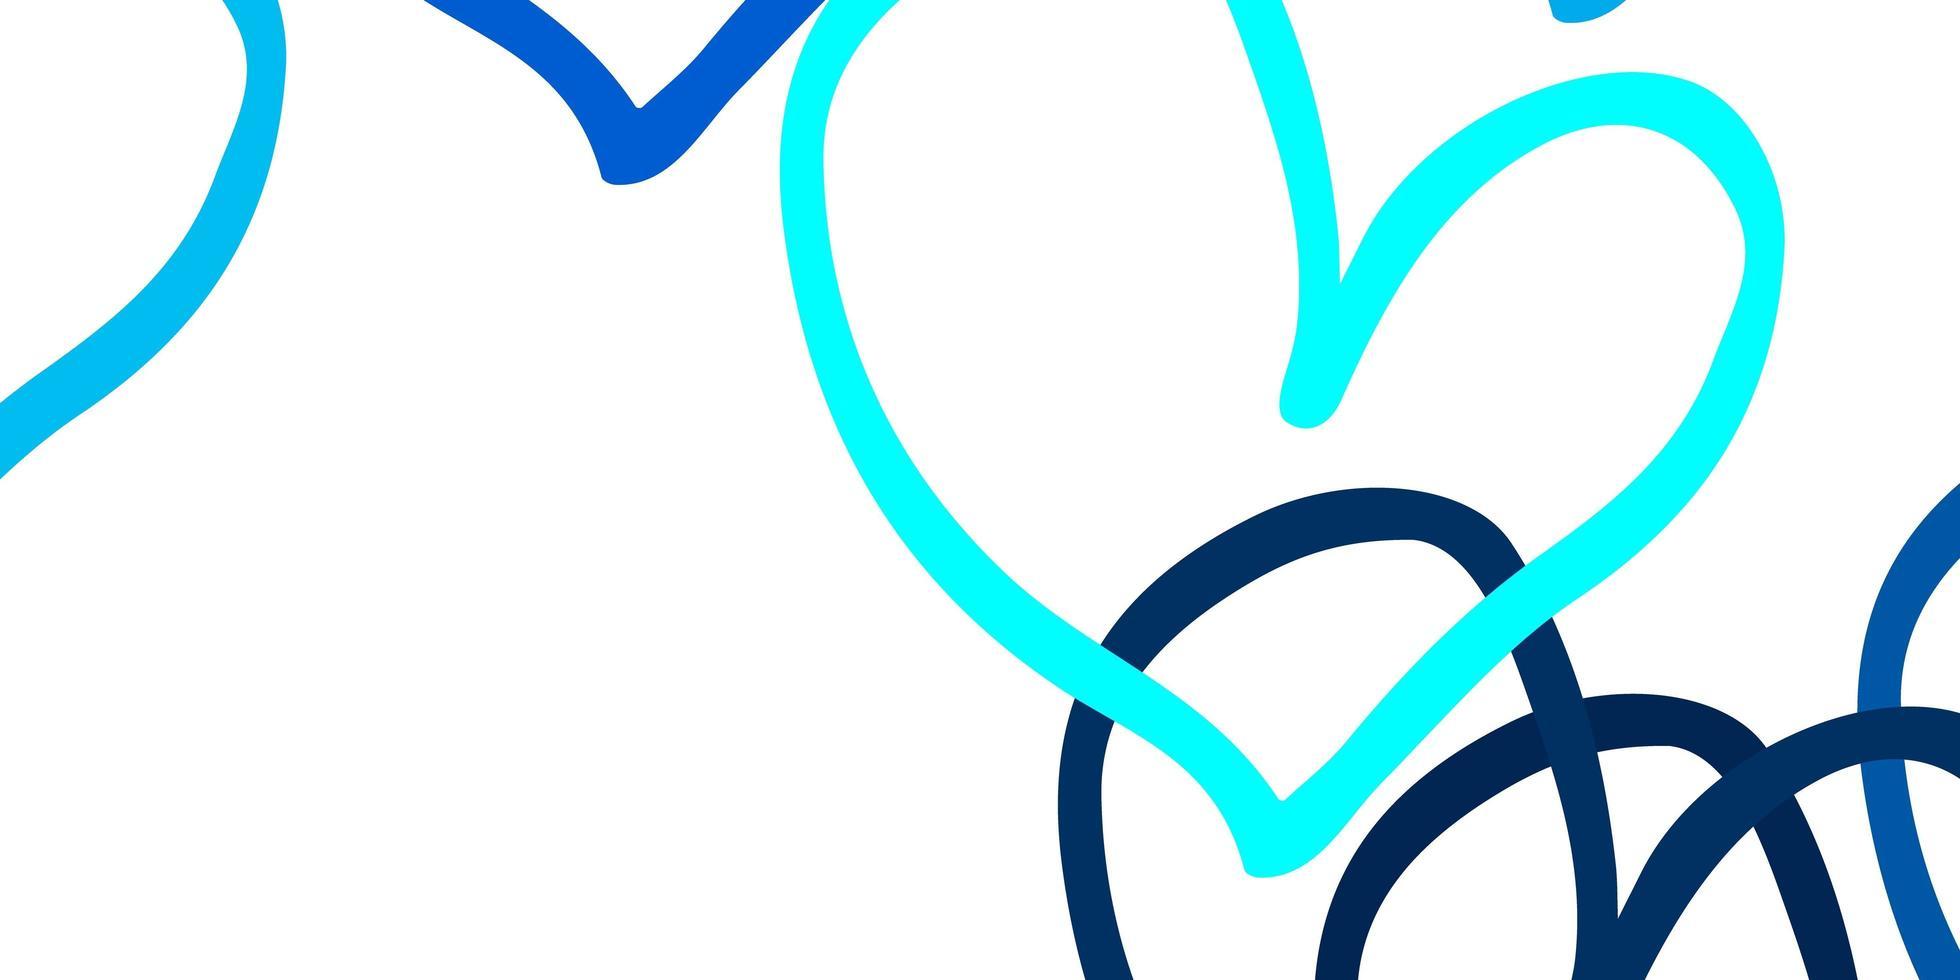 Telón de fondo de vector azul claro con corazones dulces.